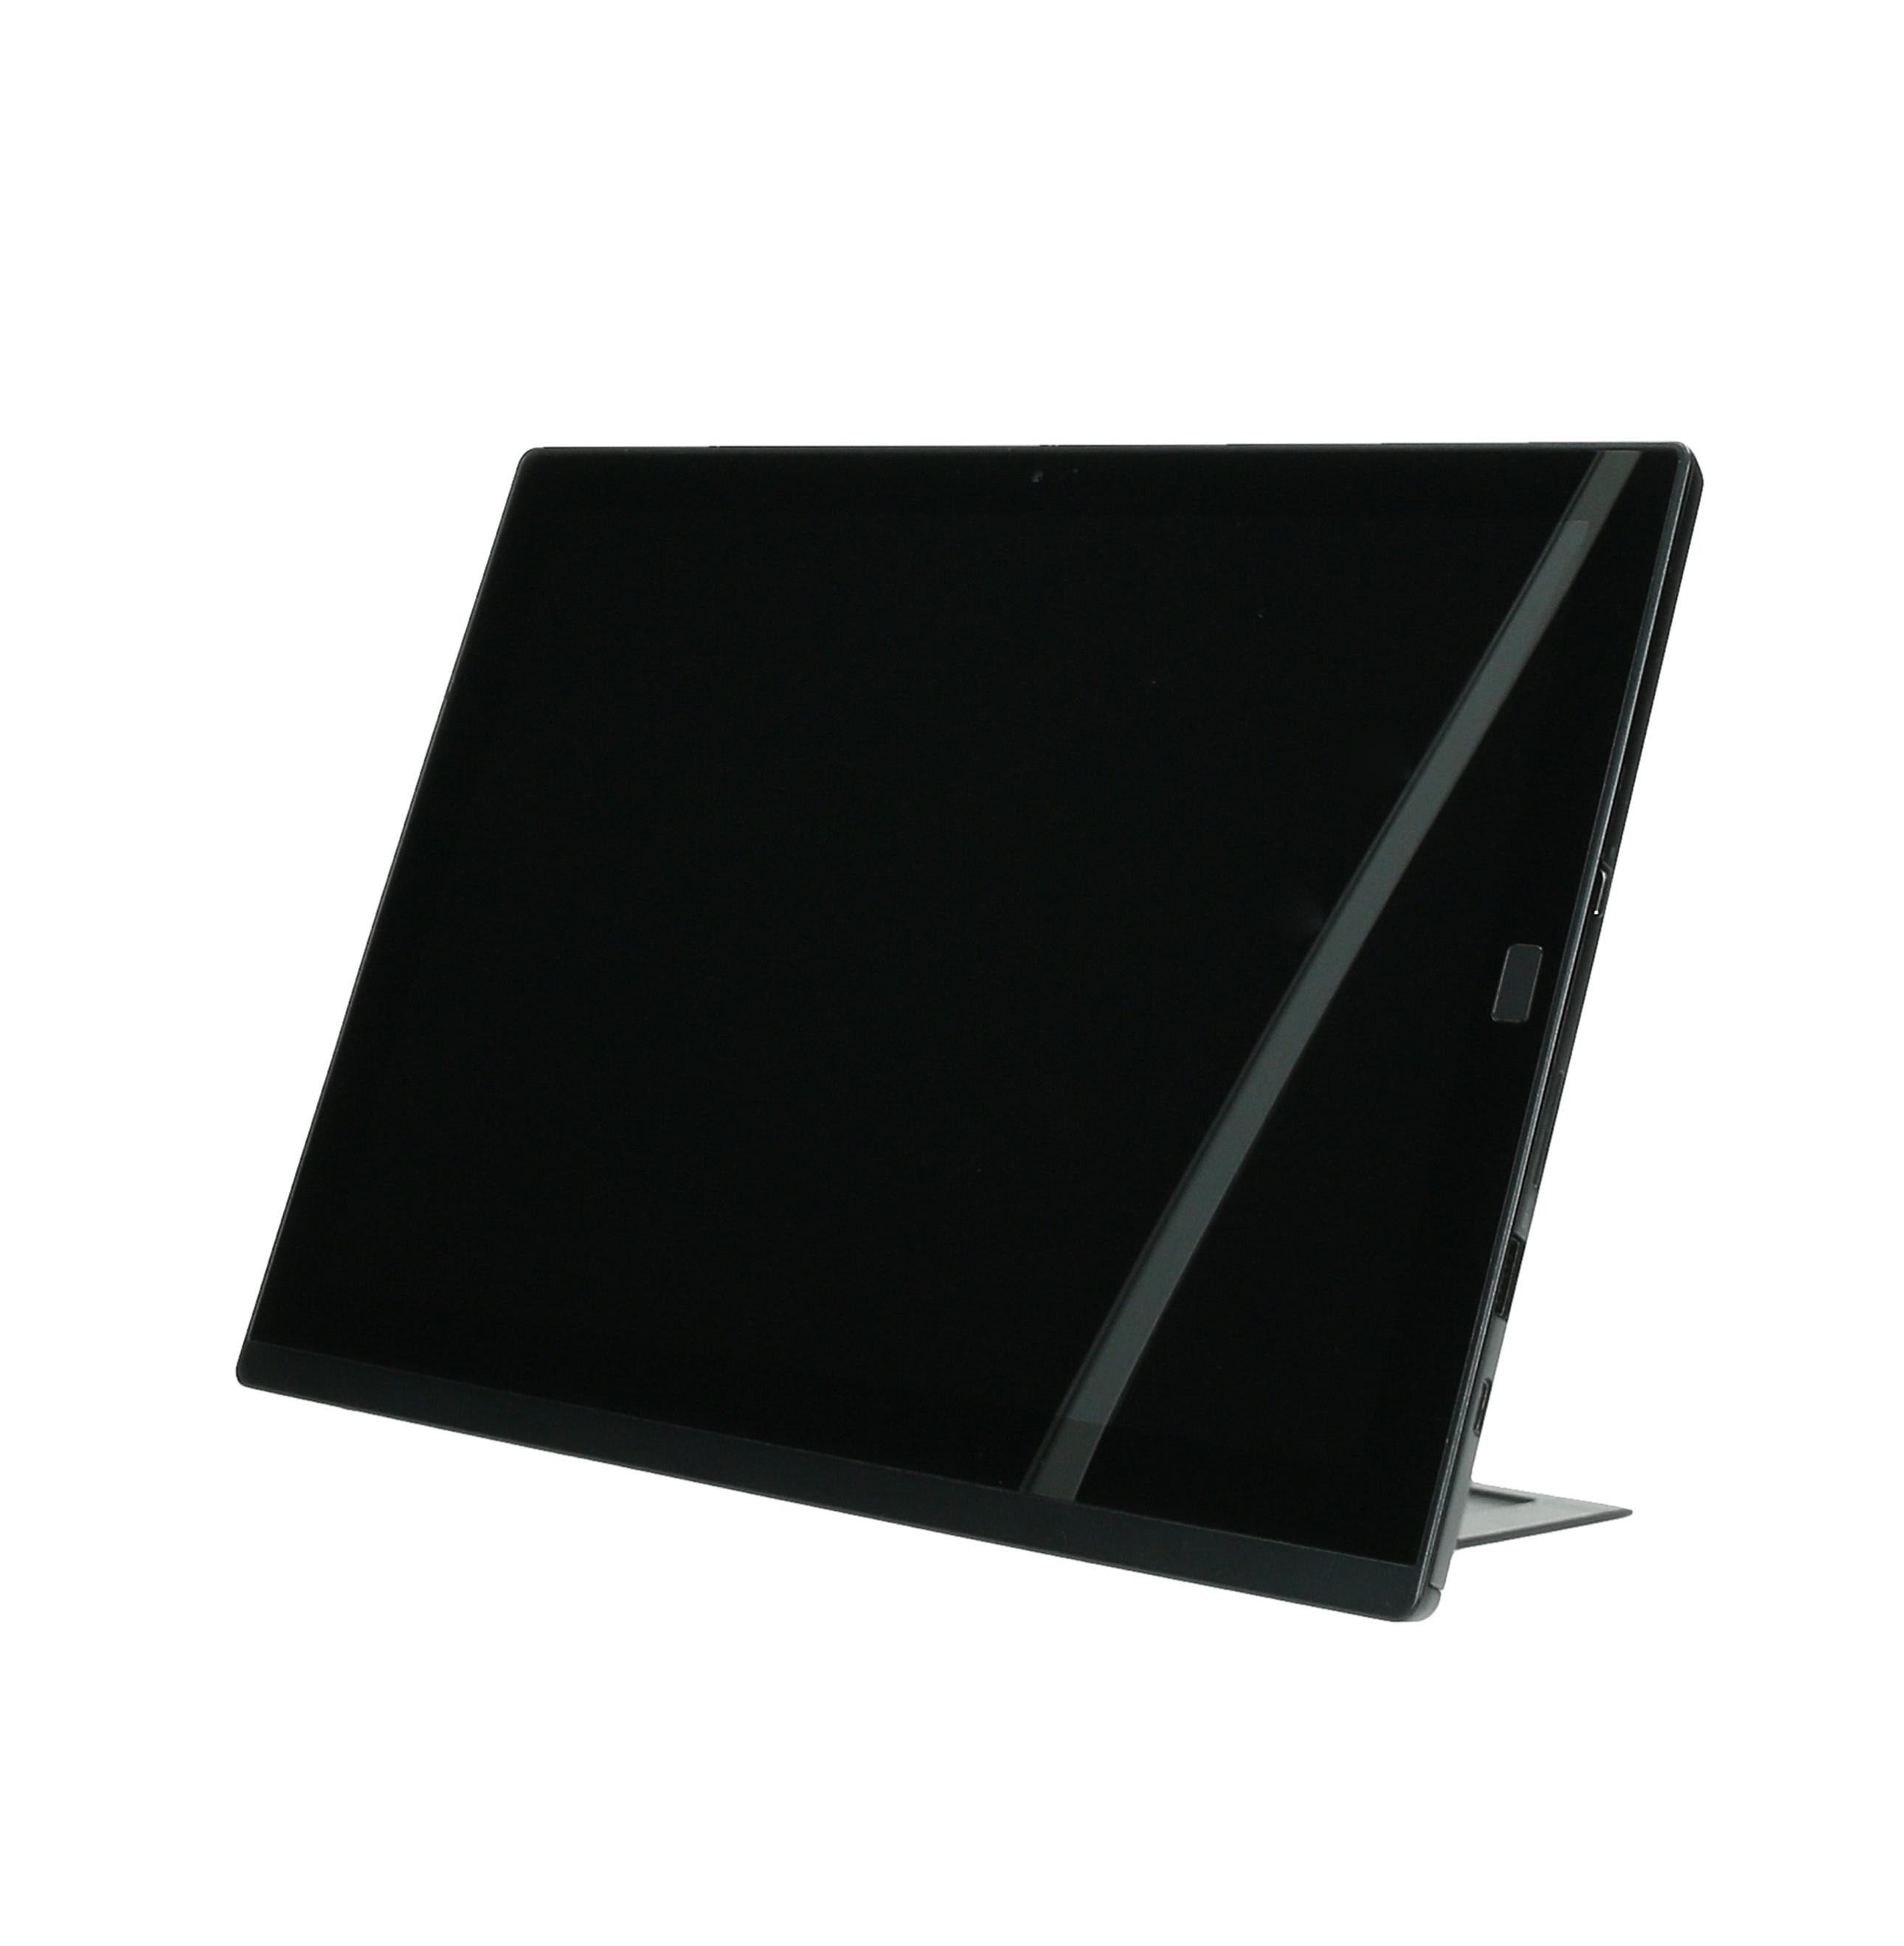 Lenovo ThinkPad X1 Tablet  - shop.bb-net.de